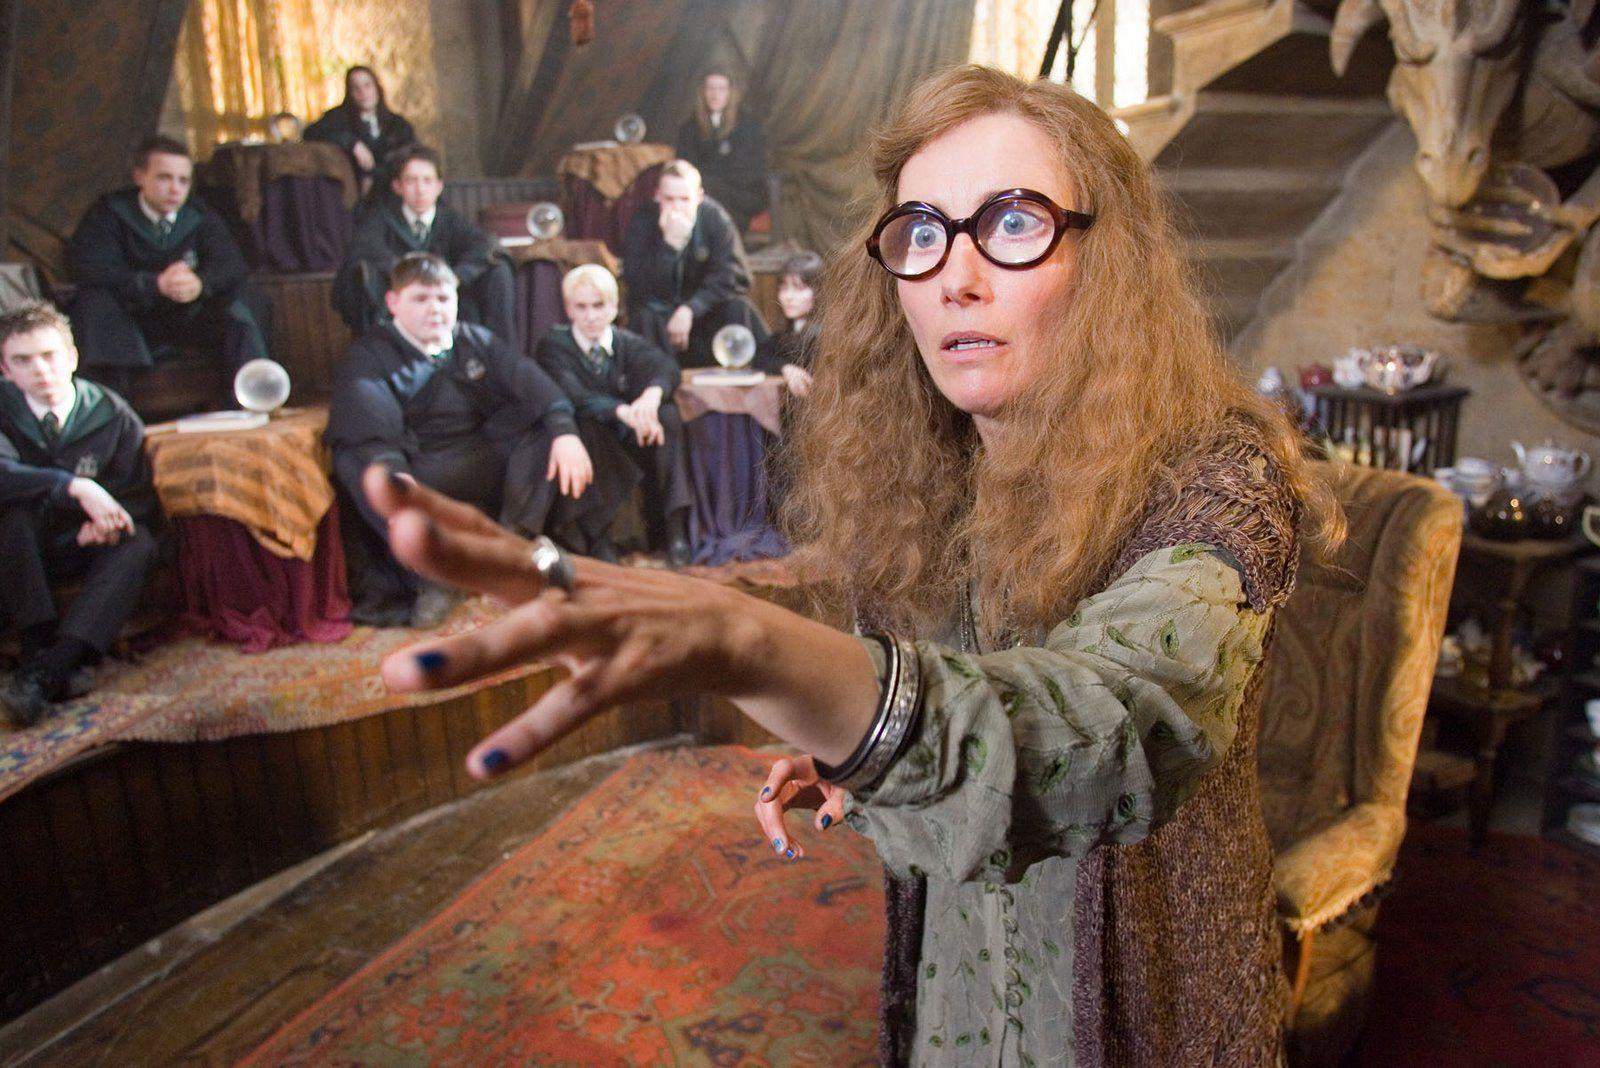 Professor Trelawney Harry Potter Filmleri Emma Thompson Harry Potter Kitaplari